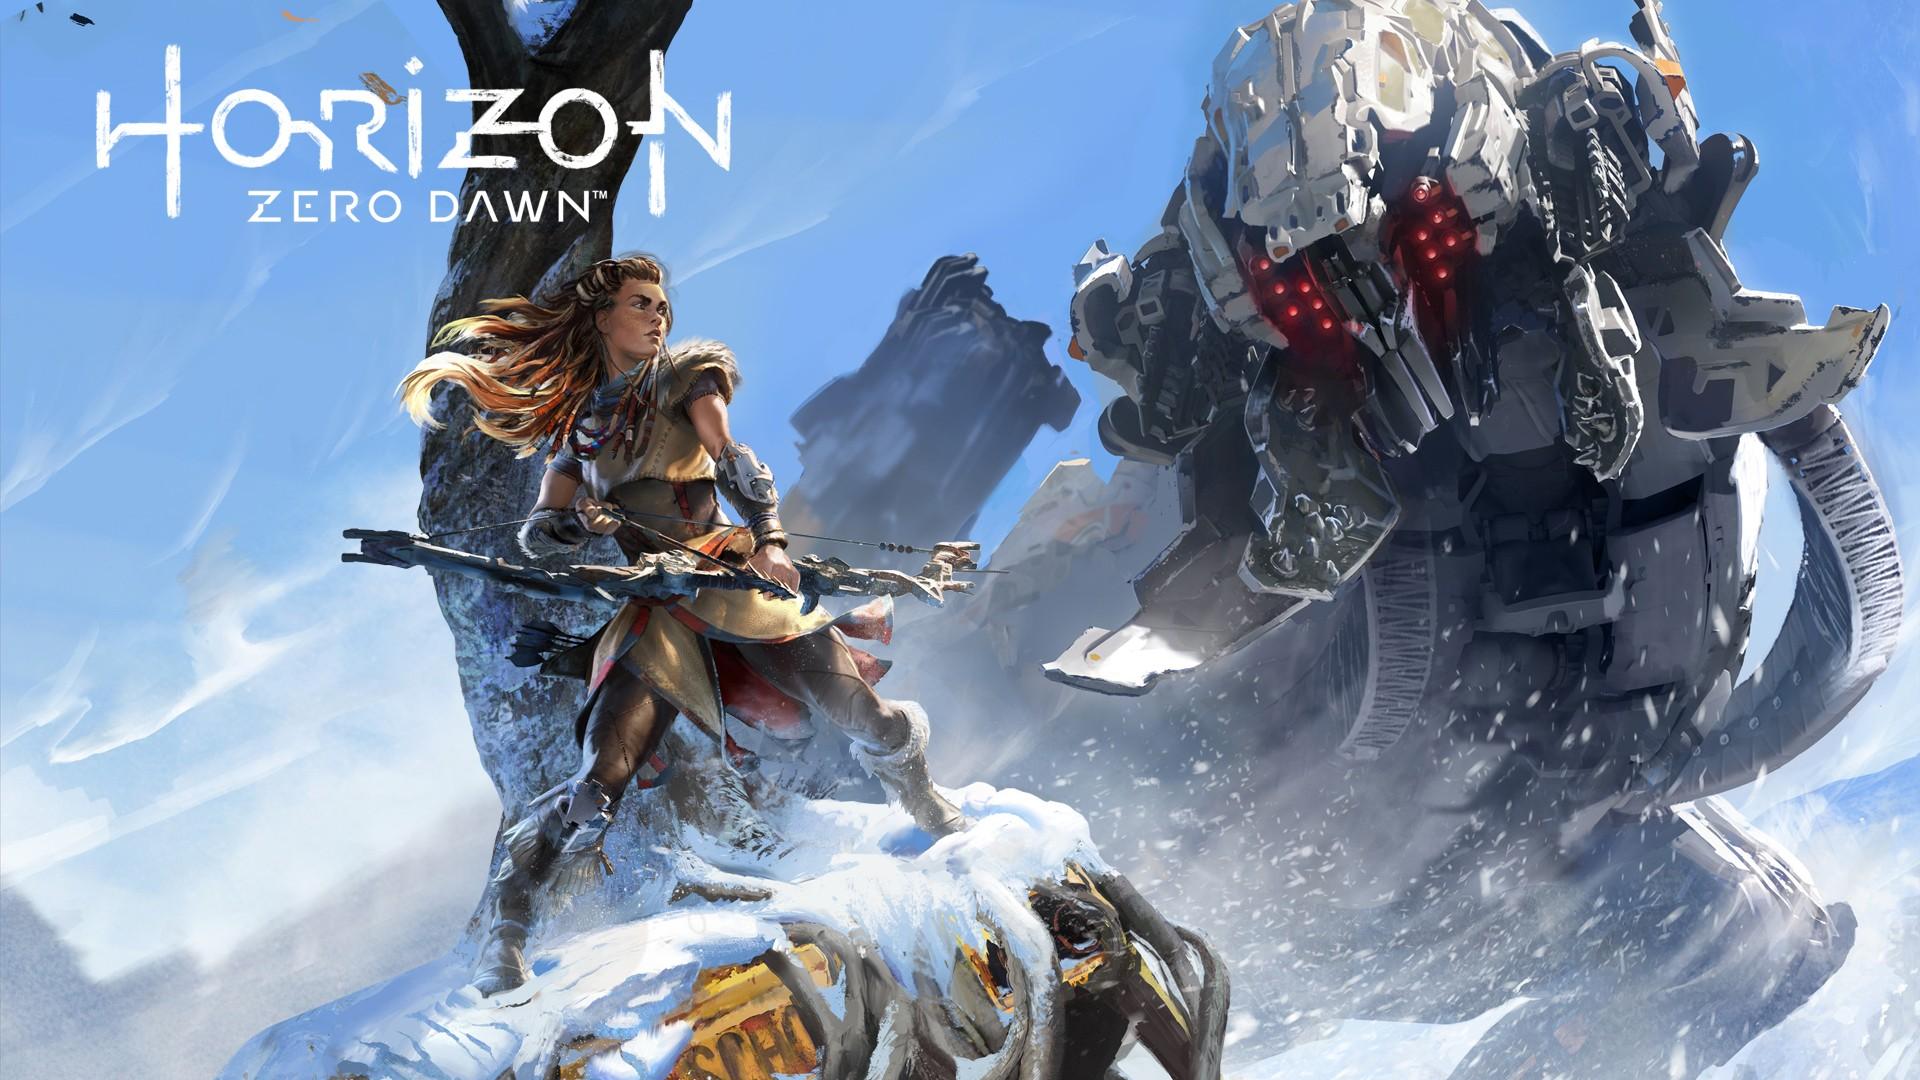 Horizon Zero Dawn Wallpaper 6